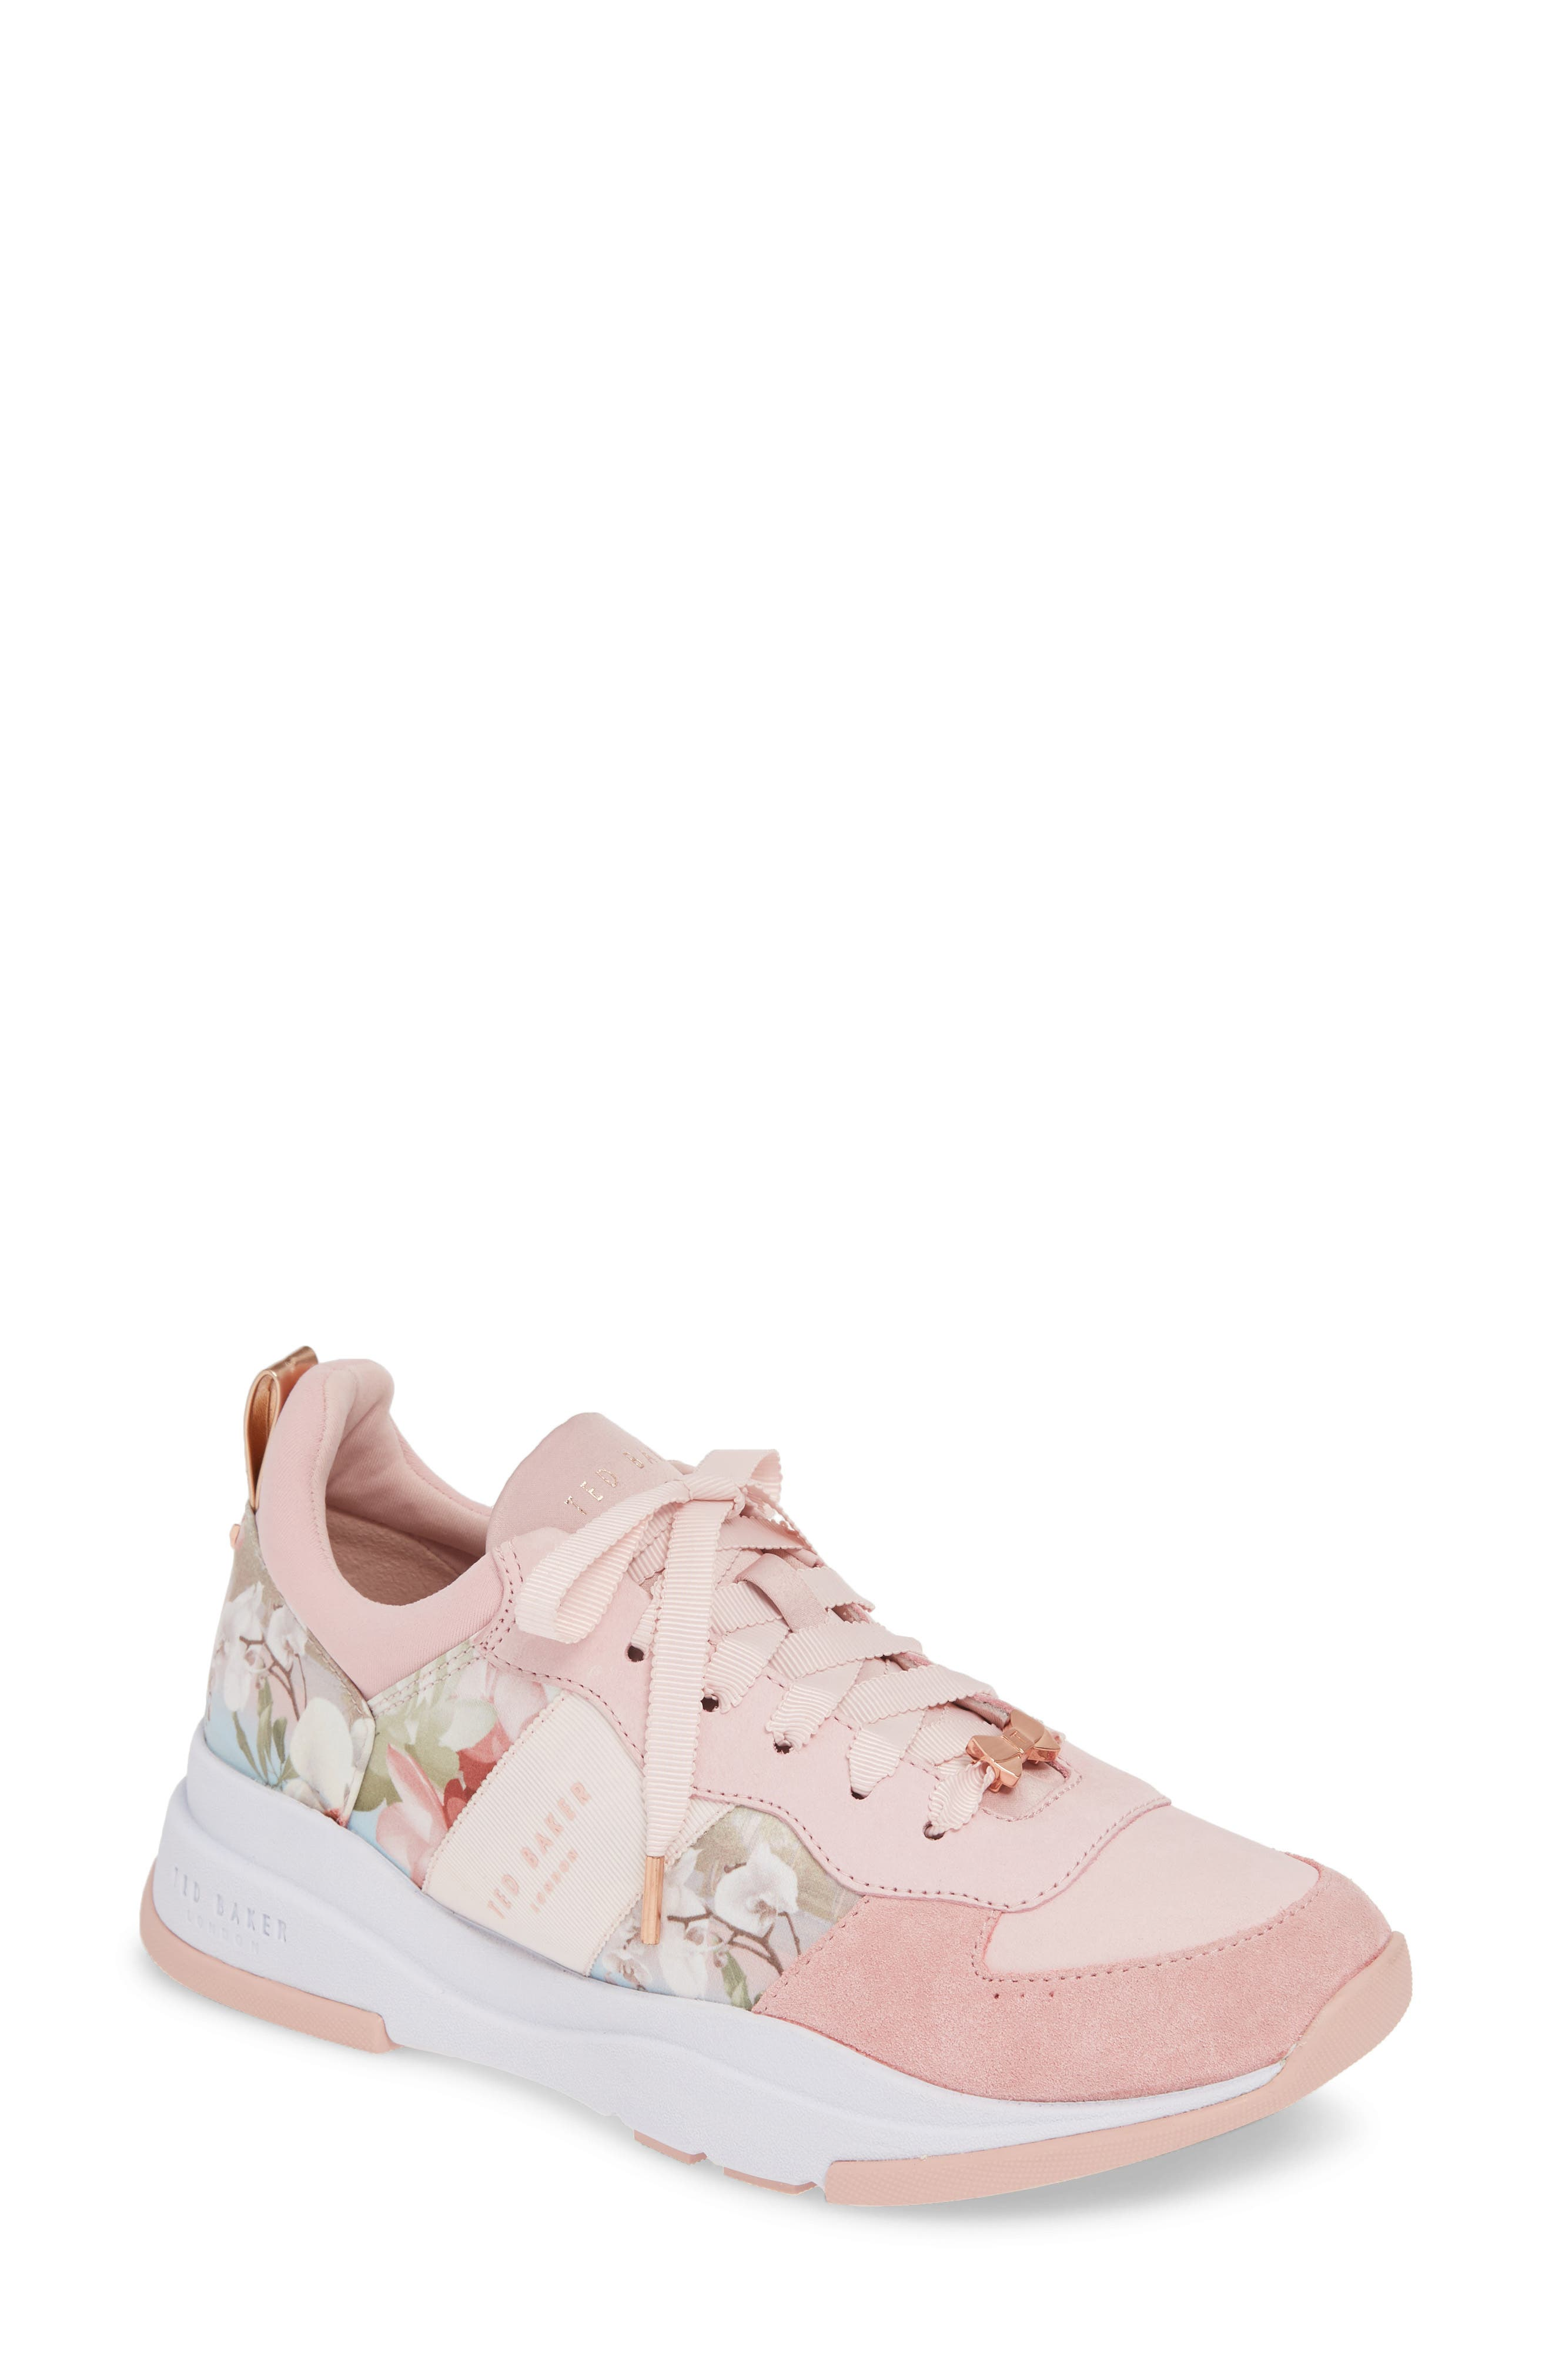 Ted Baker London Waverdi Sneaker - Pink